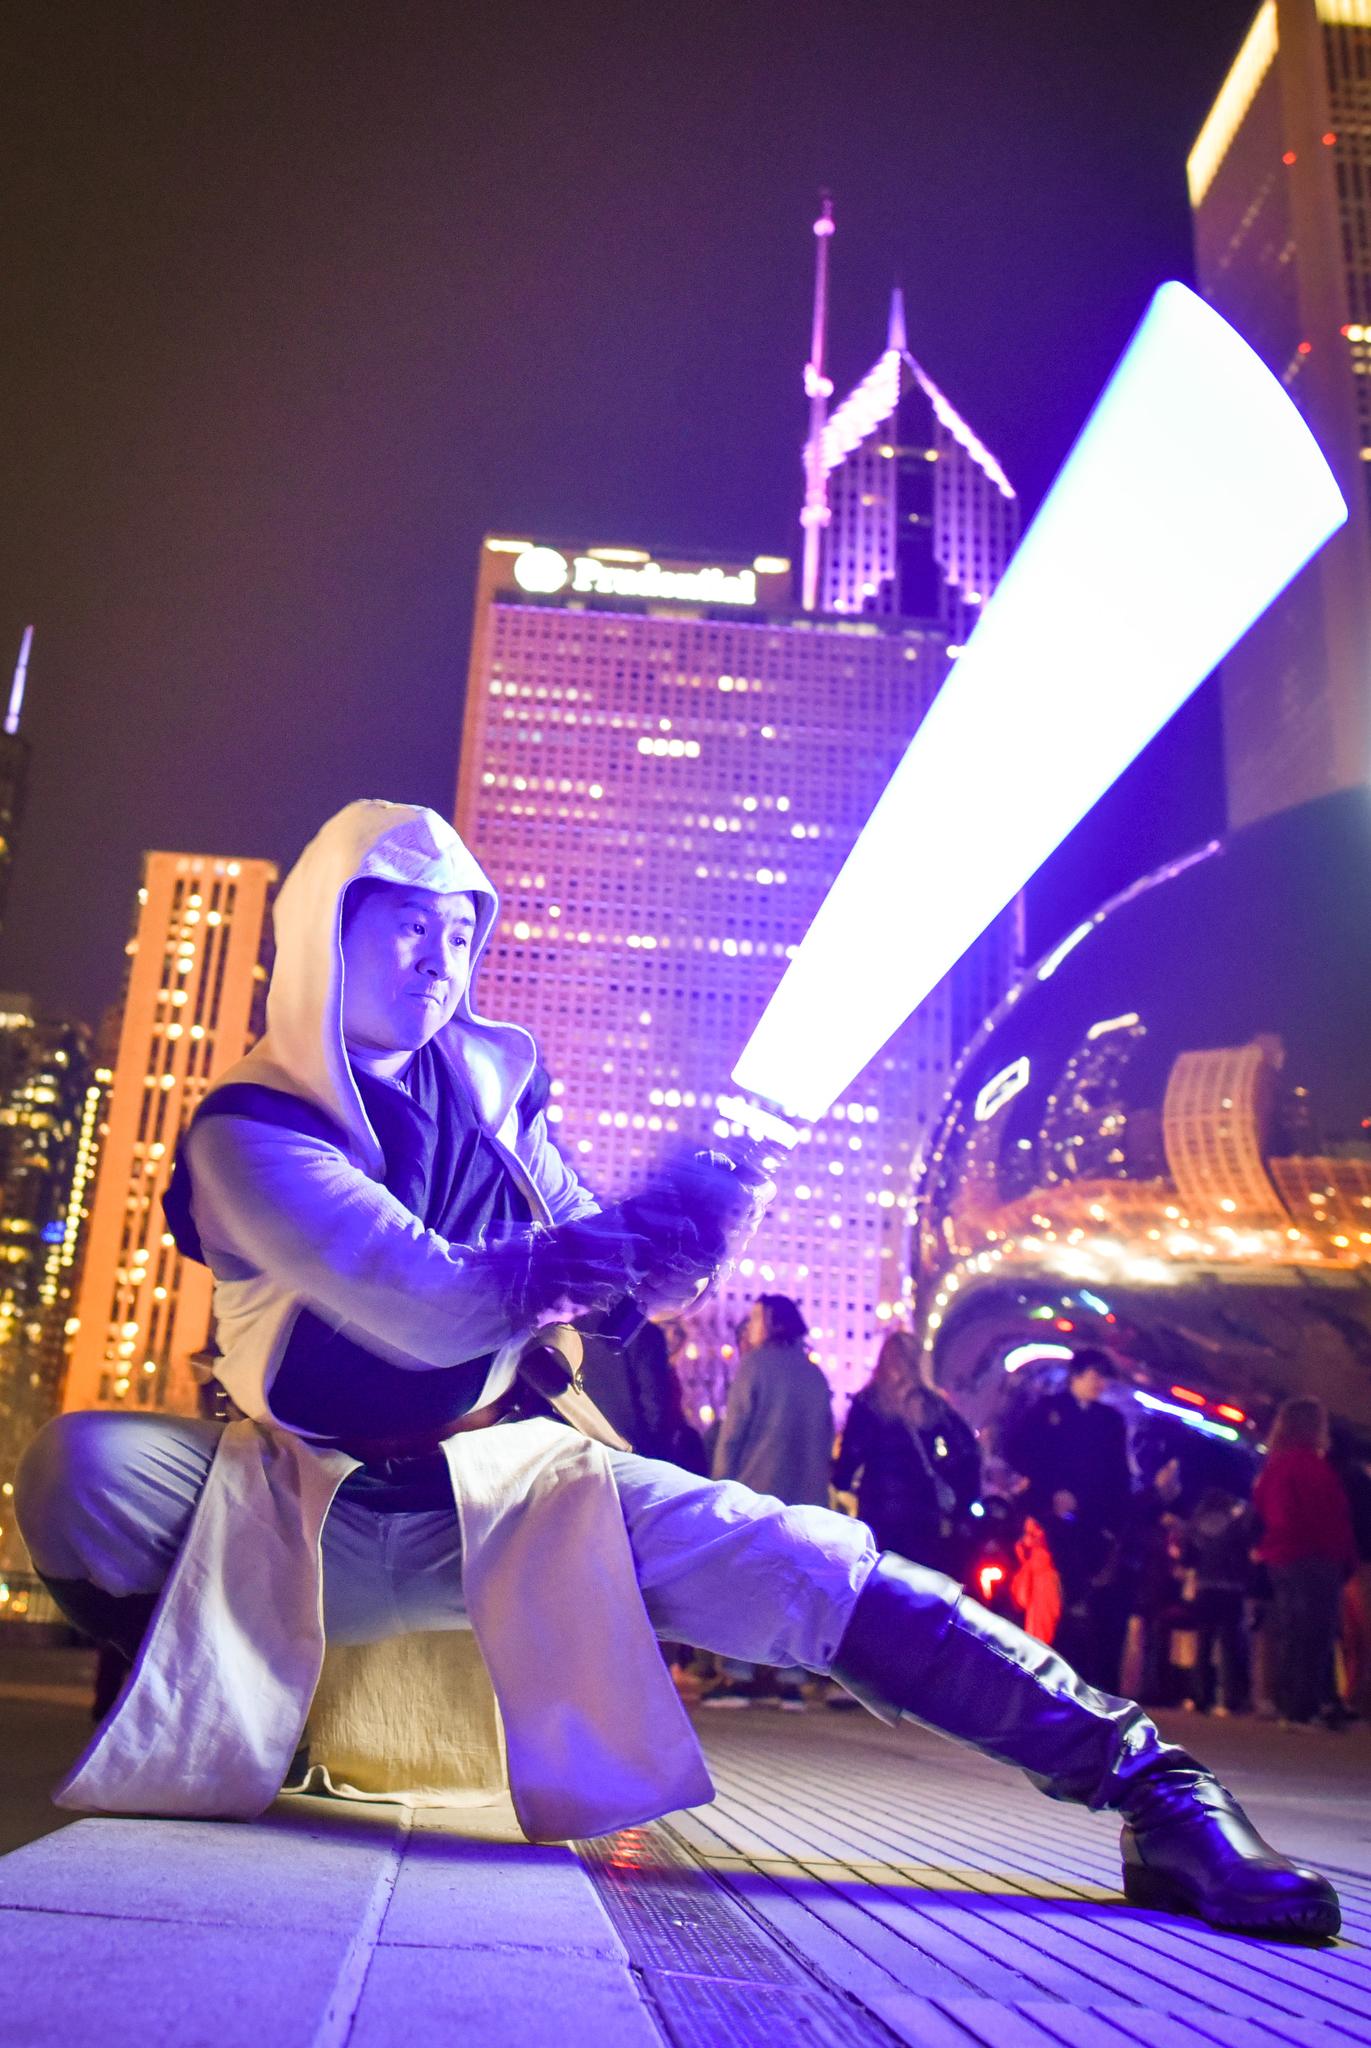 2019.04.14 - Star Wars Celebration Chicago 288888.JPG